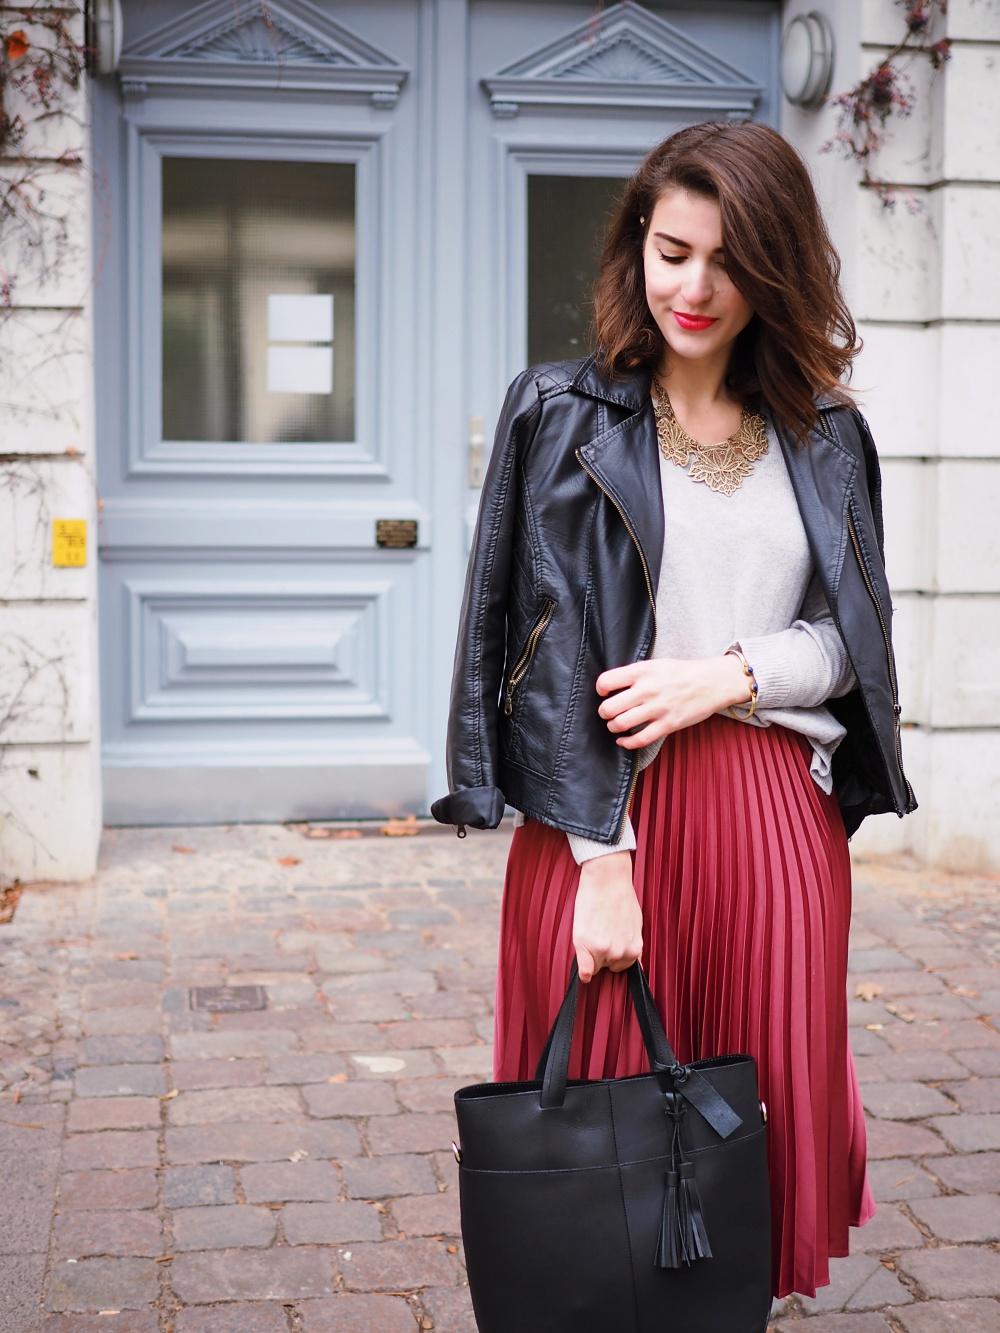 Satin Midi Skirt Fashion Blog From Berlin